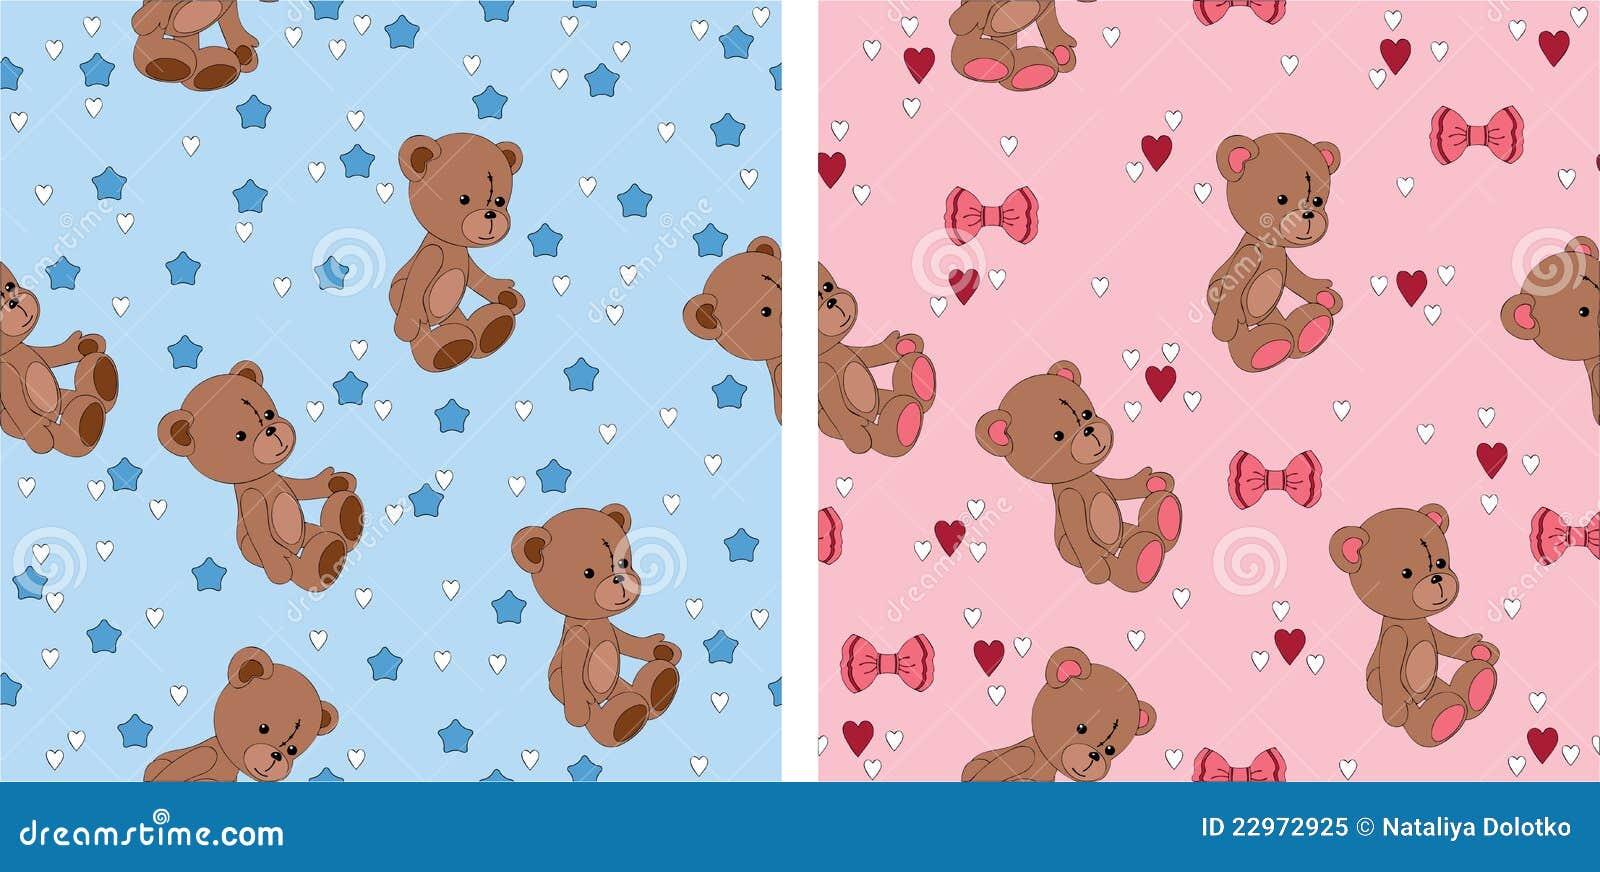 Teddy Bear Seamless Wallpapers